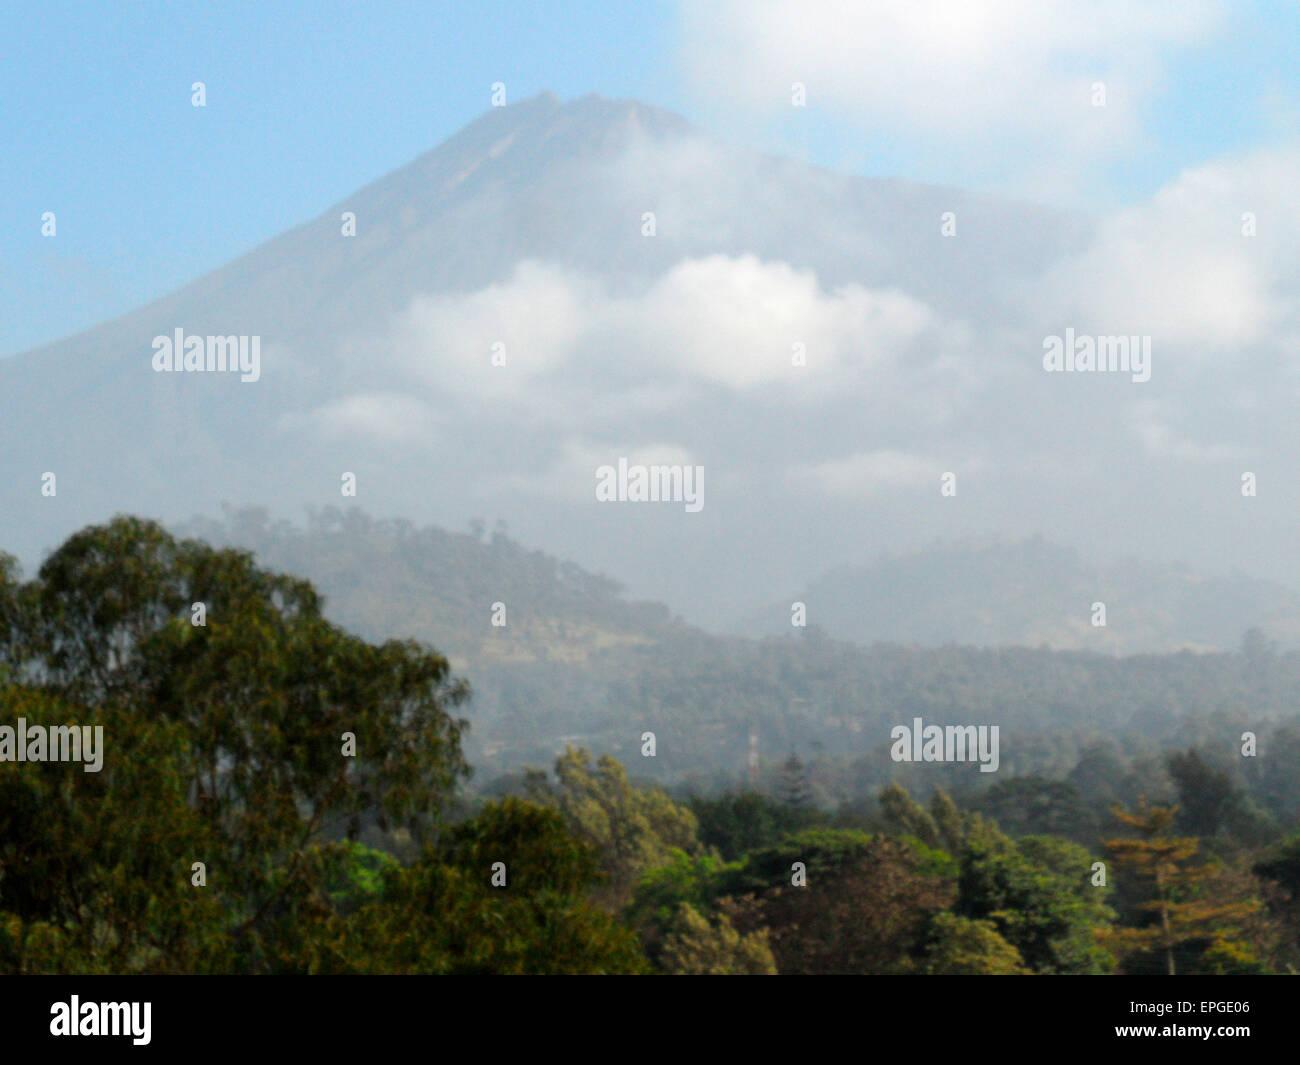 FEBRUARY 2012 - TANZANIA: Mount Meru, Tanzania, Africa. - Stock Image